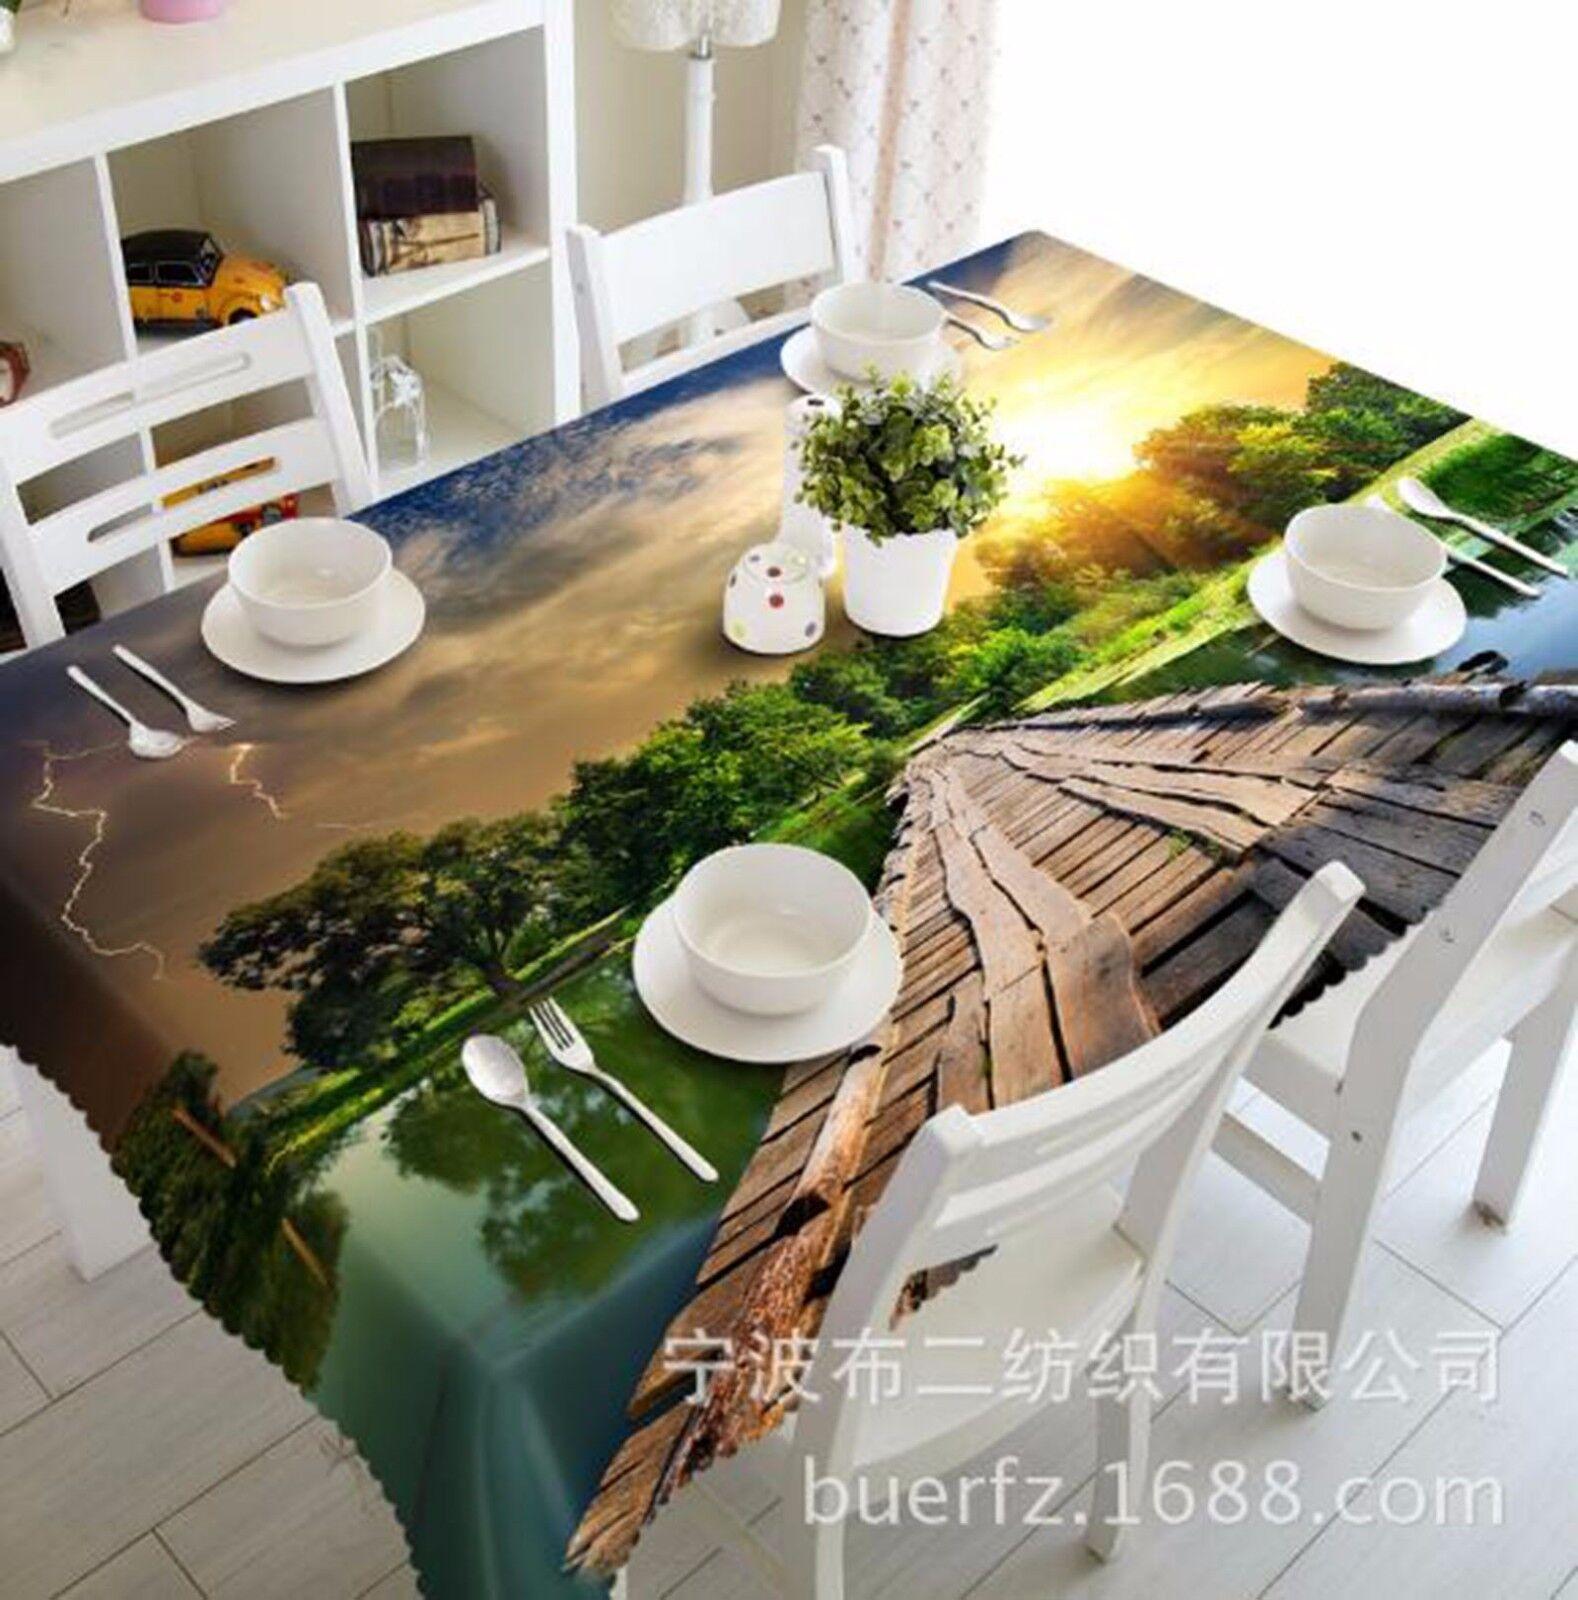 3D Bridge 402 Tablecloth Table Cover Cloth Birthday Party AJ WALLPAPER UK Lemon